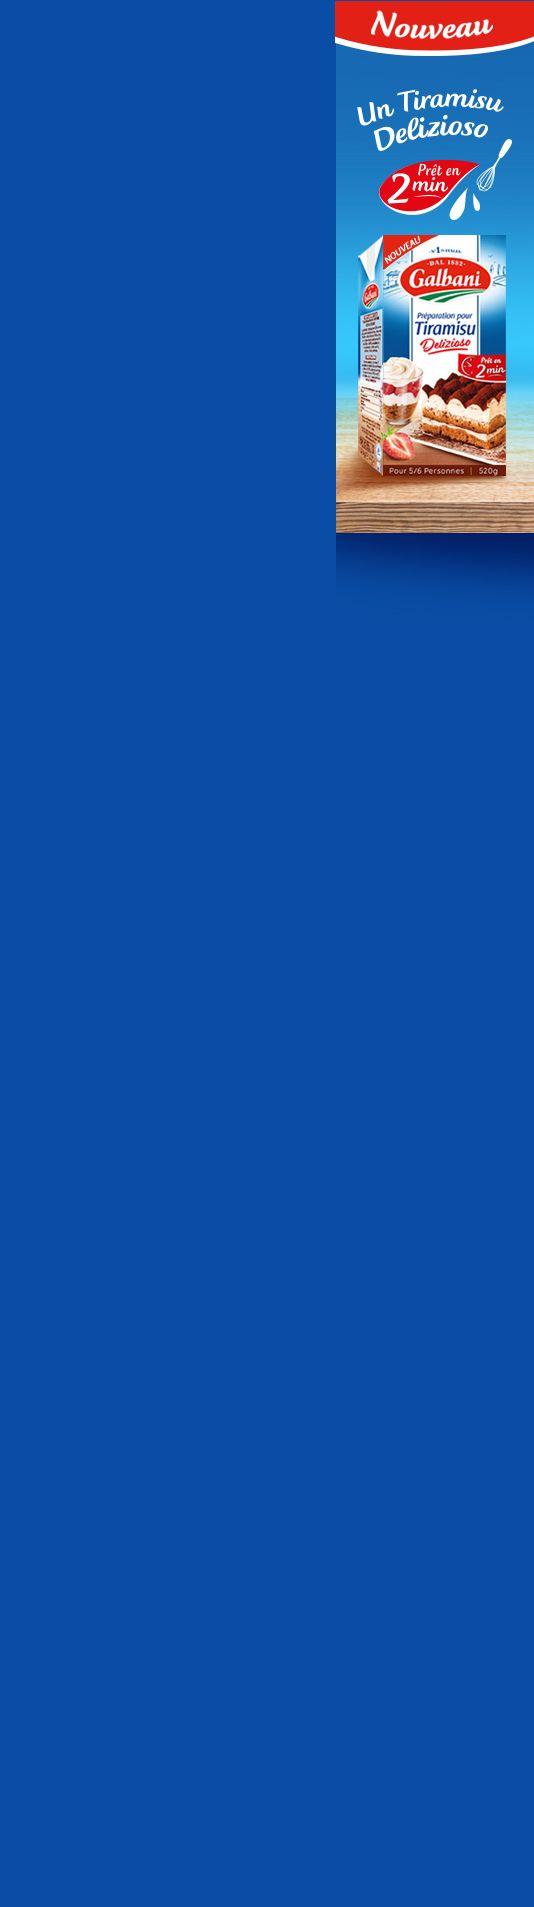 Recette - Gratin de pâtes poireaux, chorizo et Ricotta – Recette Pâtes, Adoptez la Ricott'attitude, -Pâtes – Sauces pour pâtes, -Gratins, Gratins et plats au four | Il Gusto Italiano